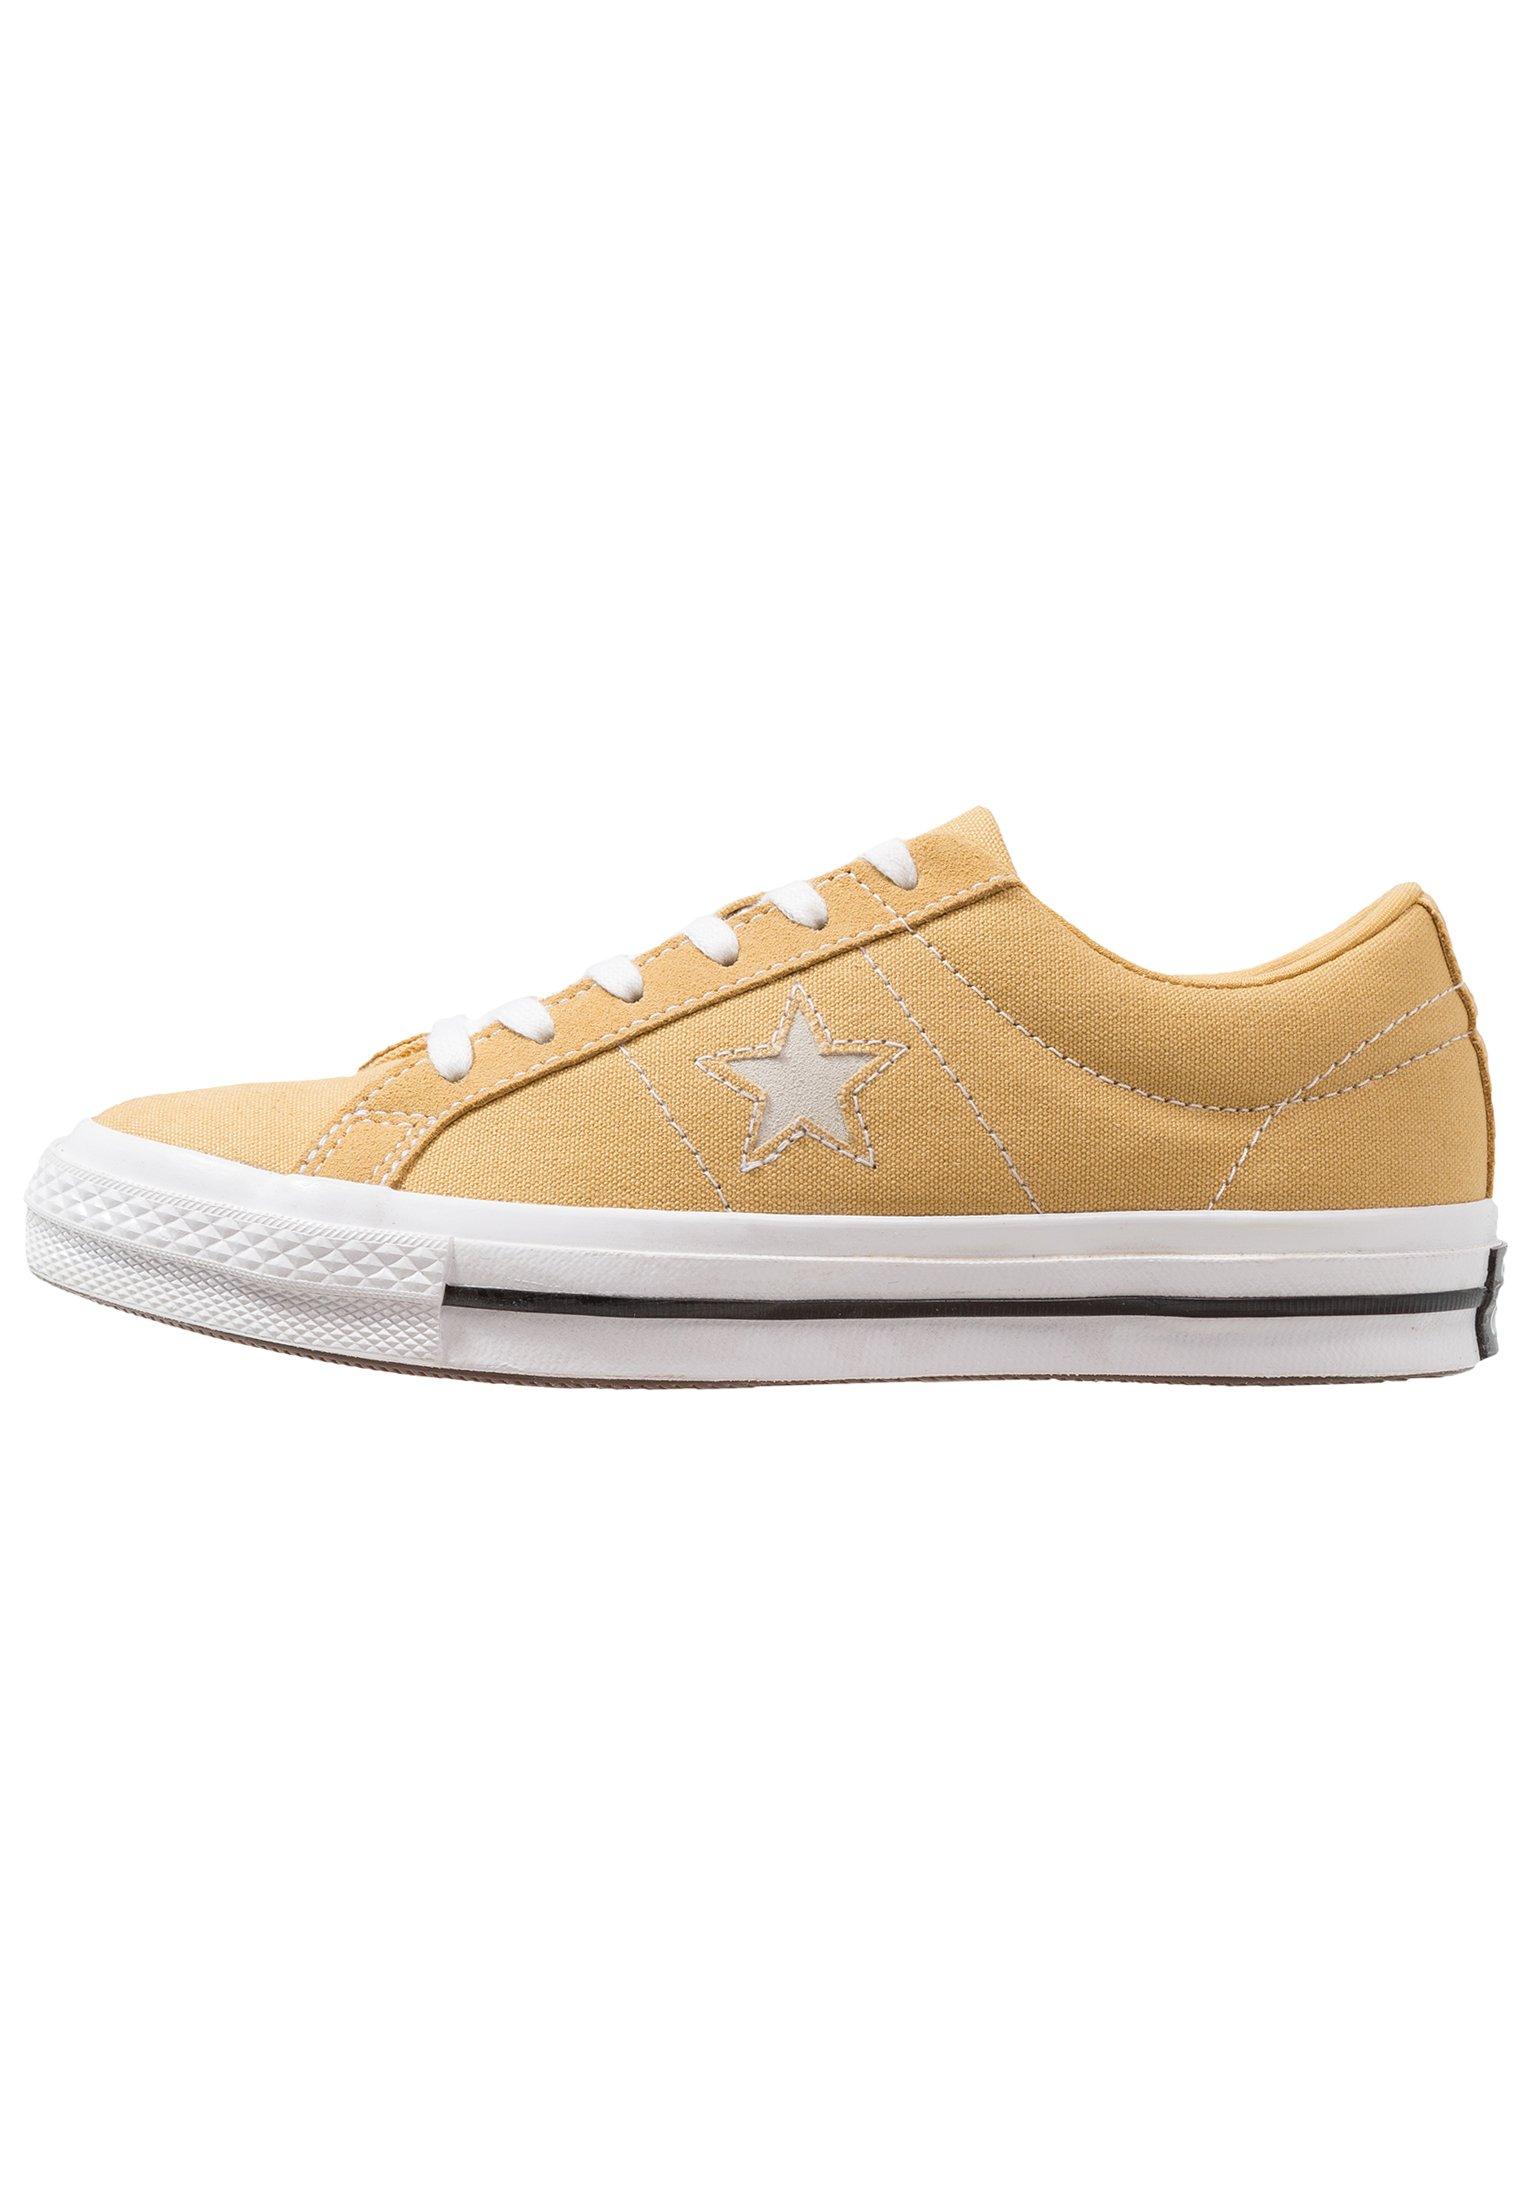 chaussures homme converse jaune